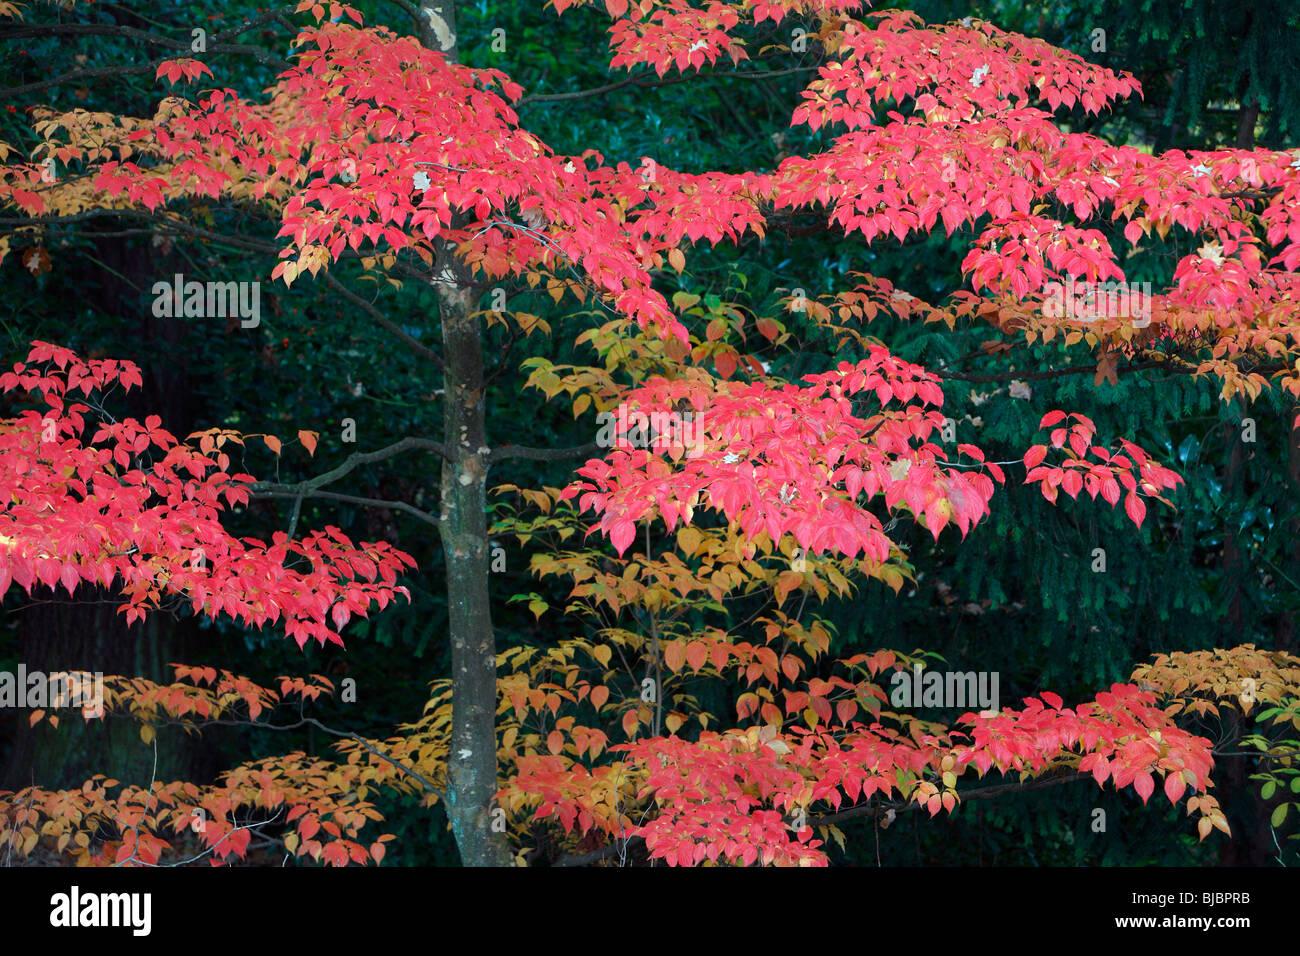 Table Dogwood (Cornus Controversa), Tree In Park Showing Autumn Colour,  Germany, Origin Japan, China, Himalaya